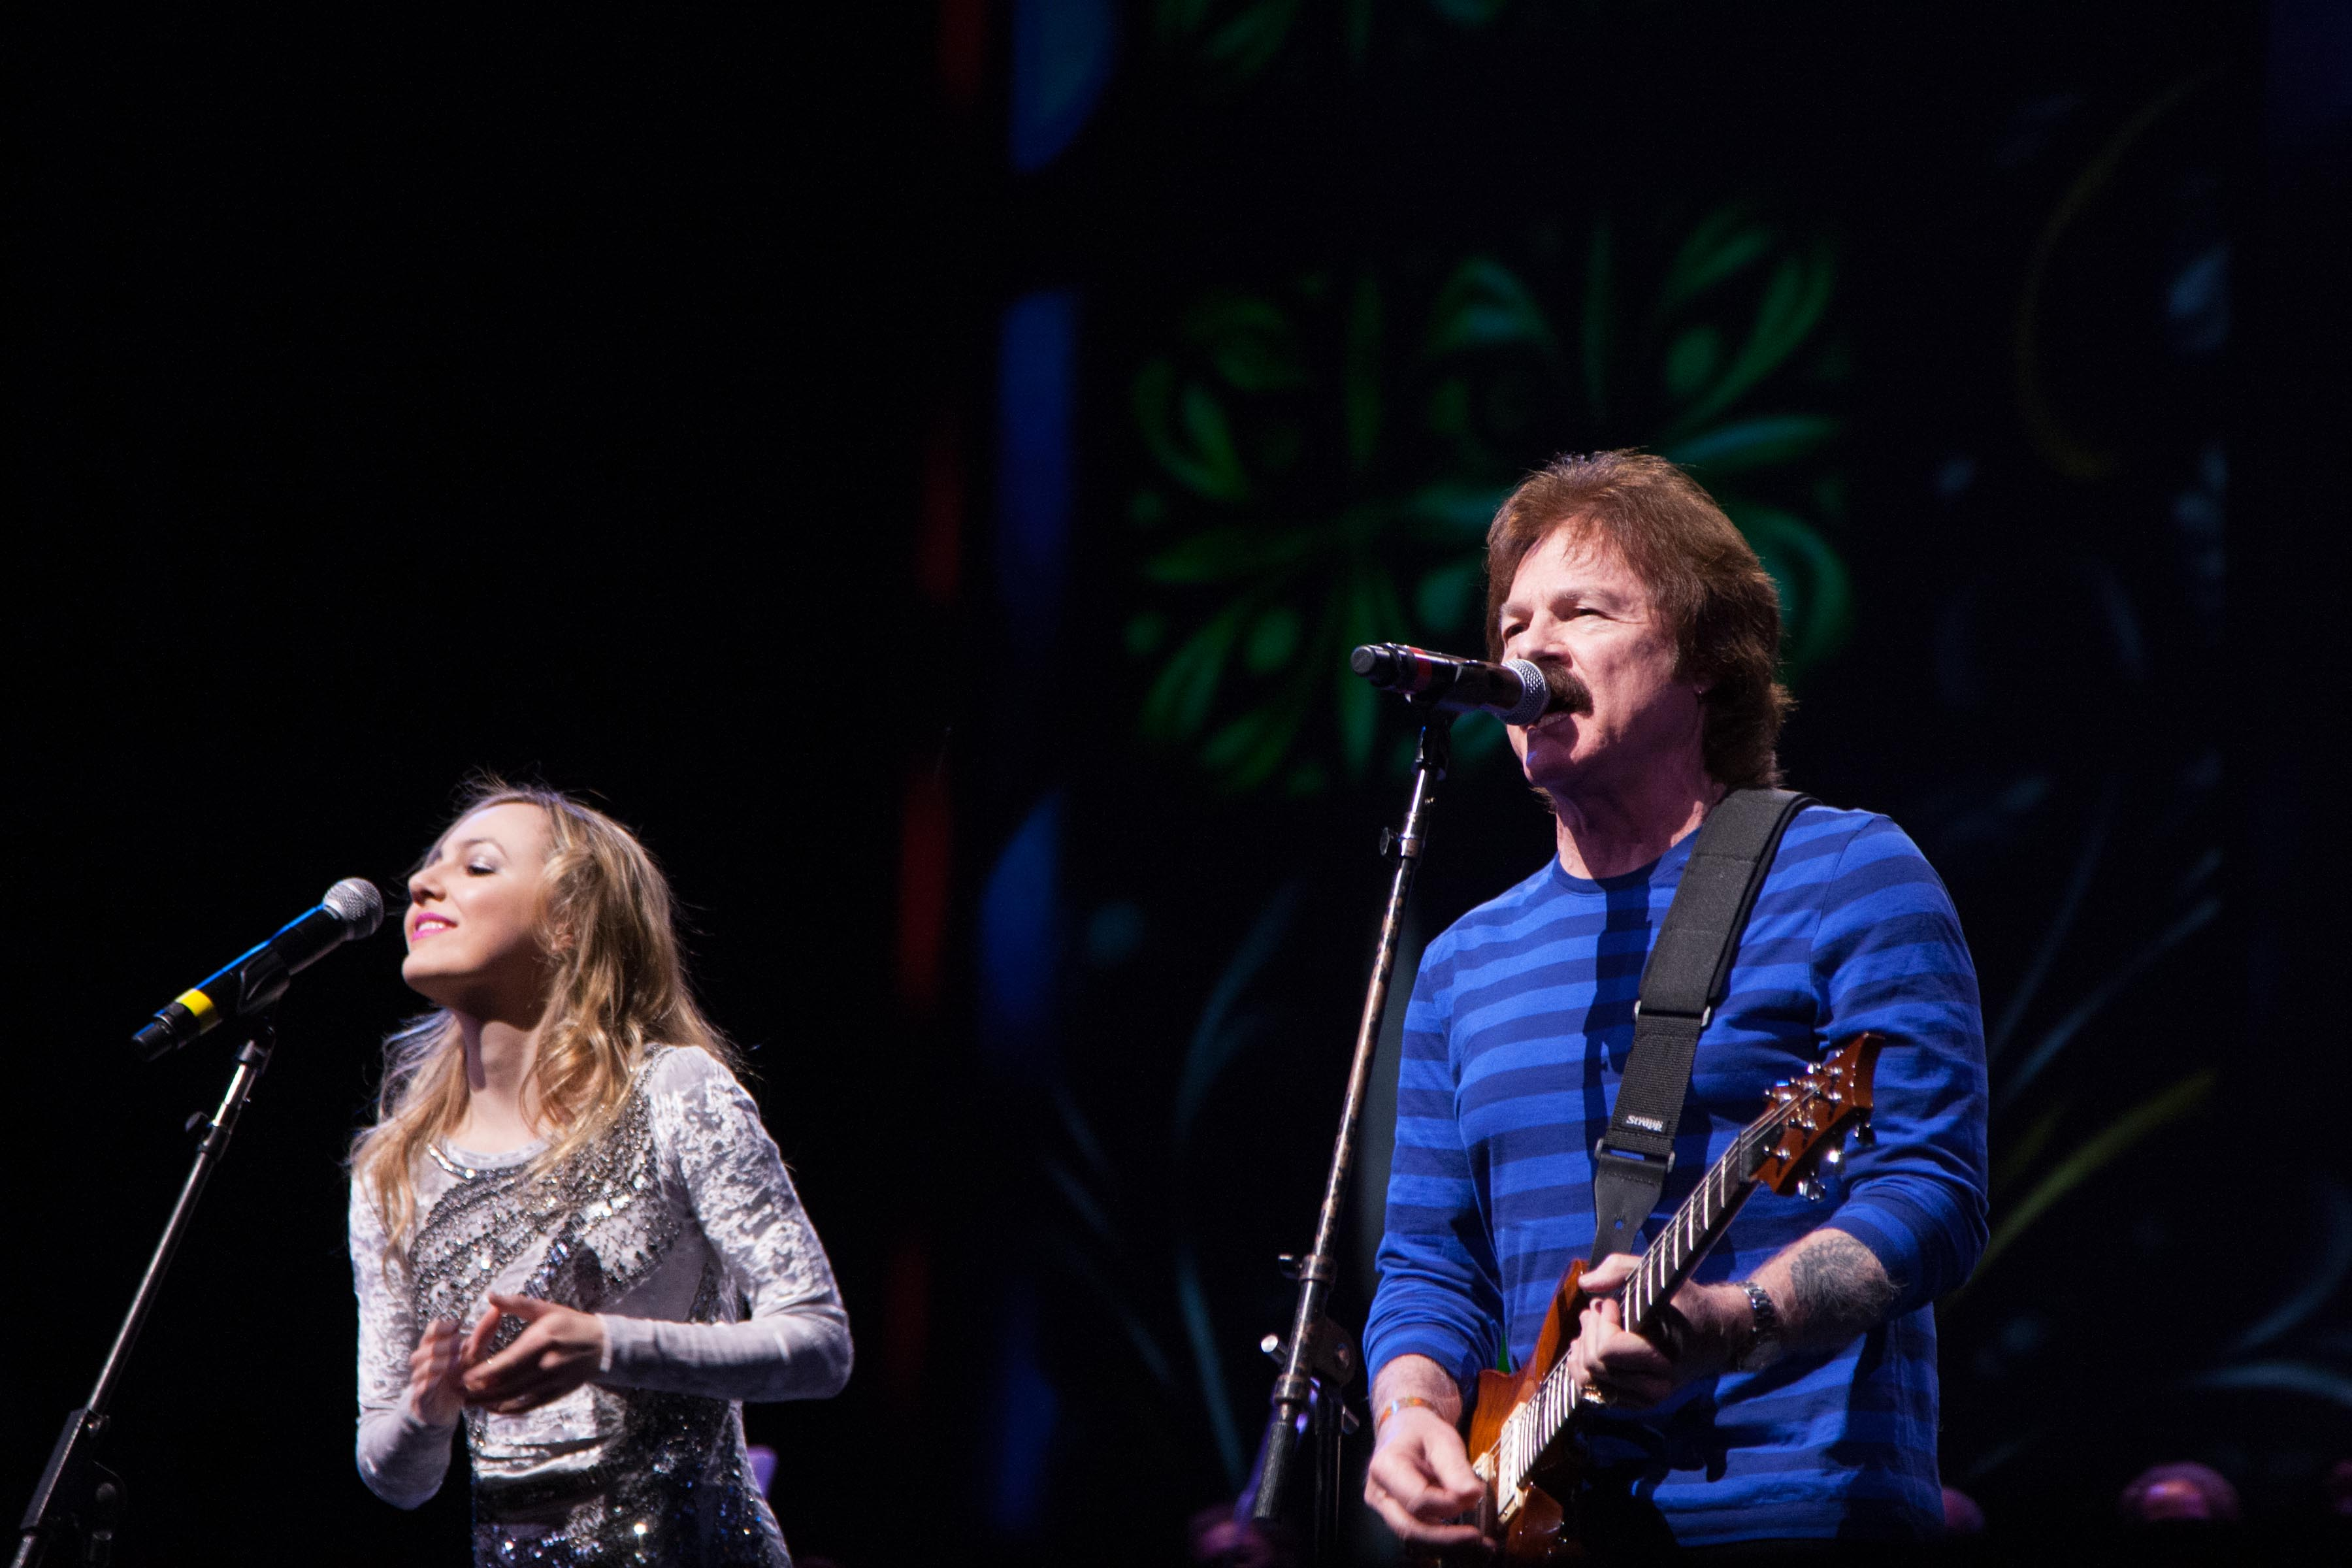 Performance by Lara Johnson and  Tom Johnson